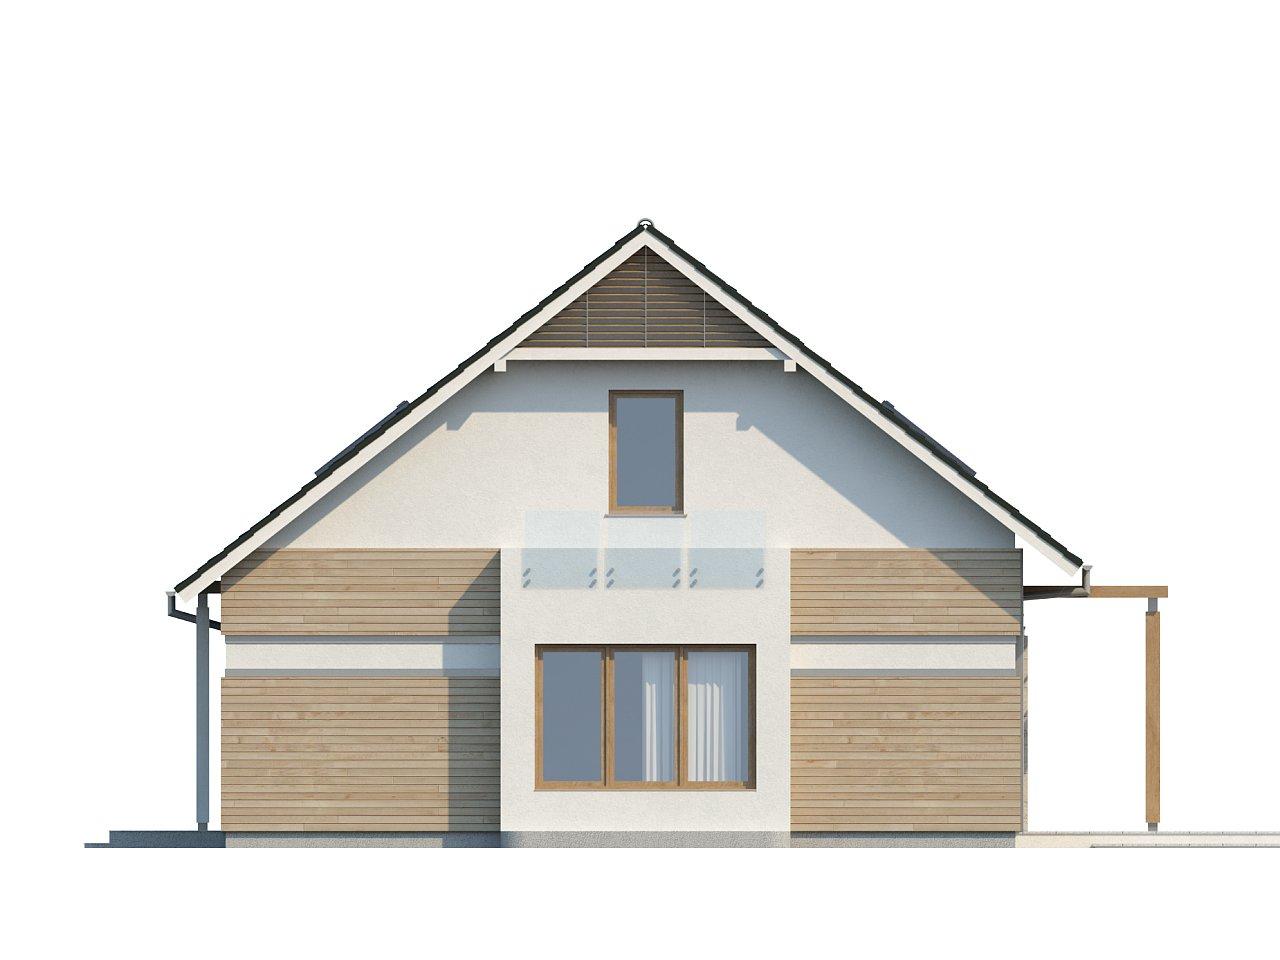 Проект практичного дома с эркером и гаражом на одну машину. 24